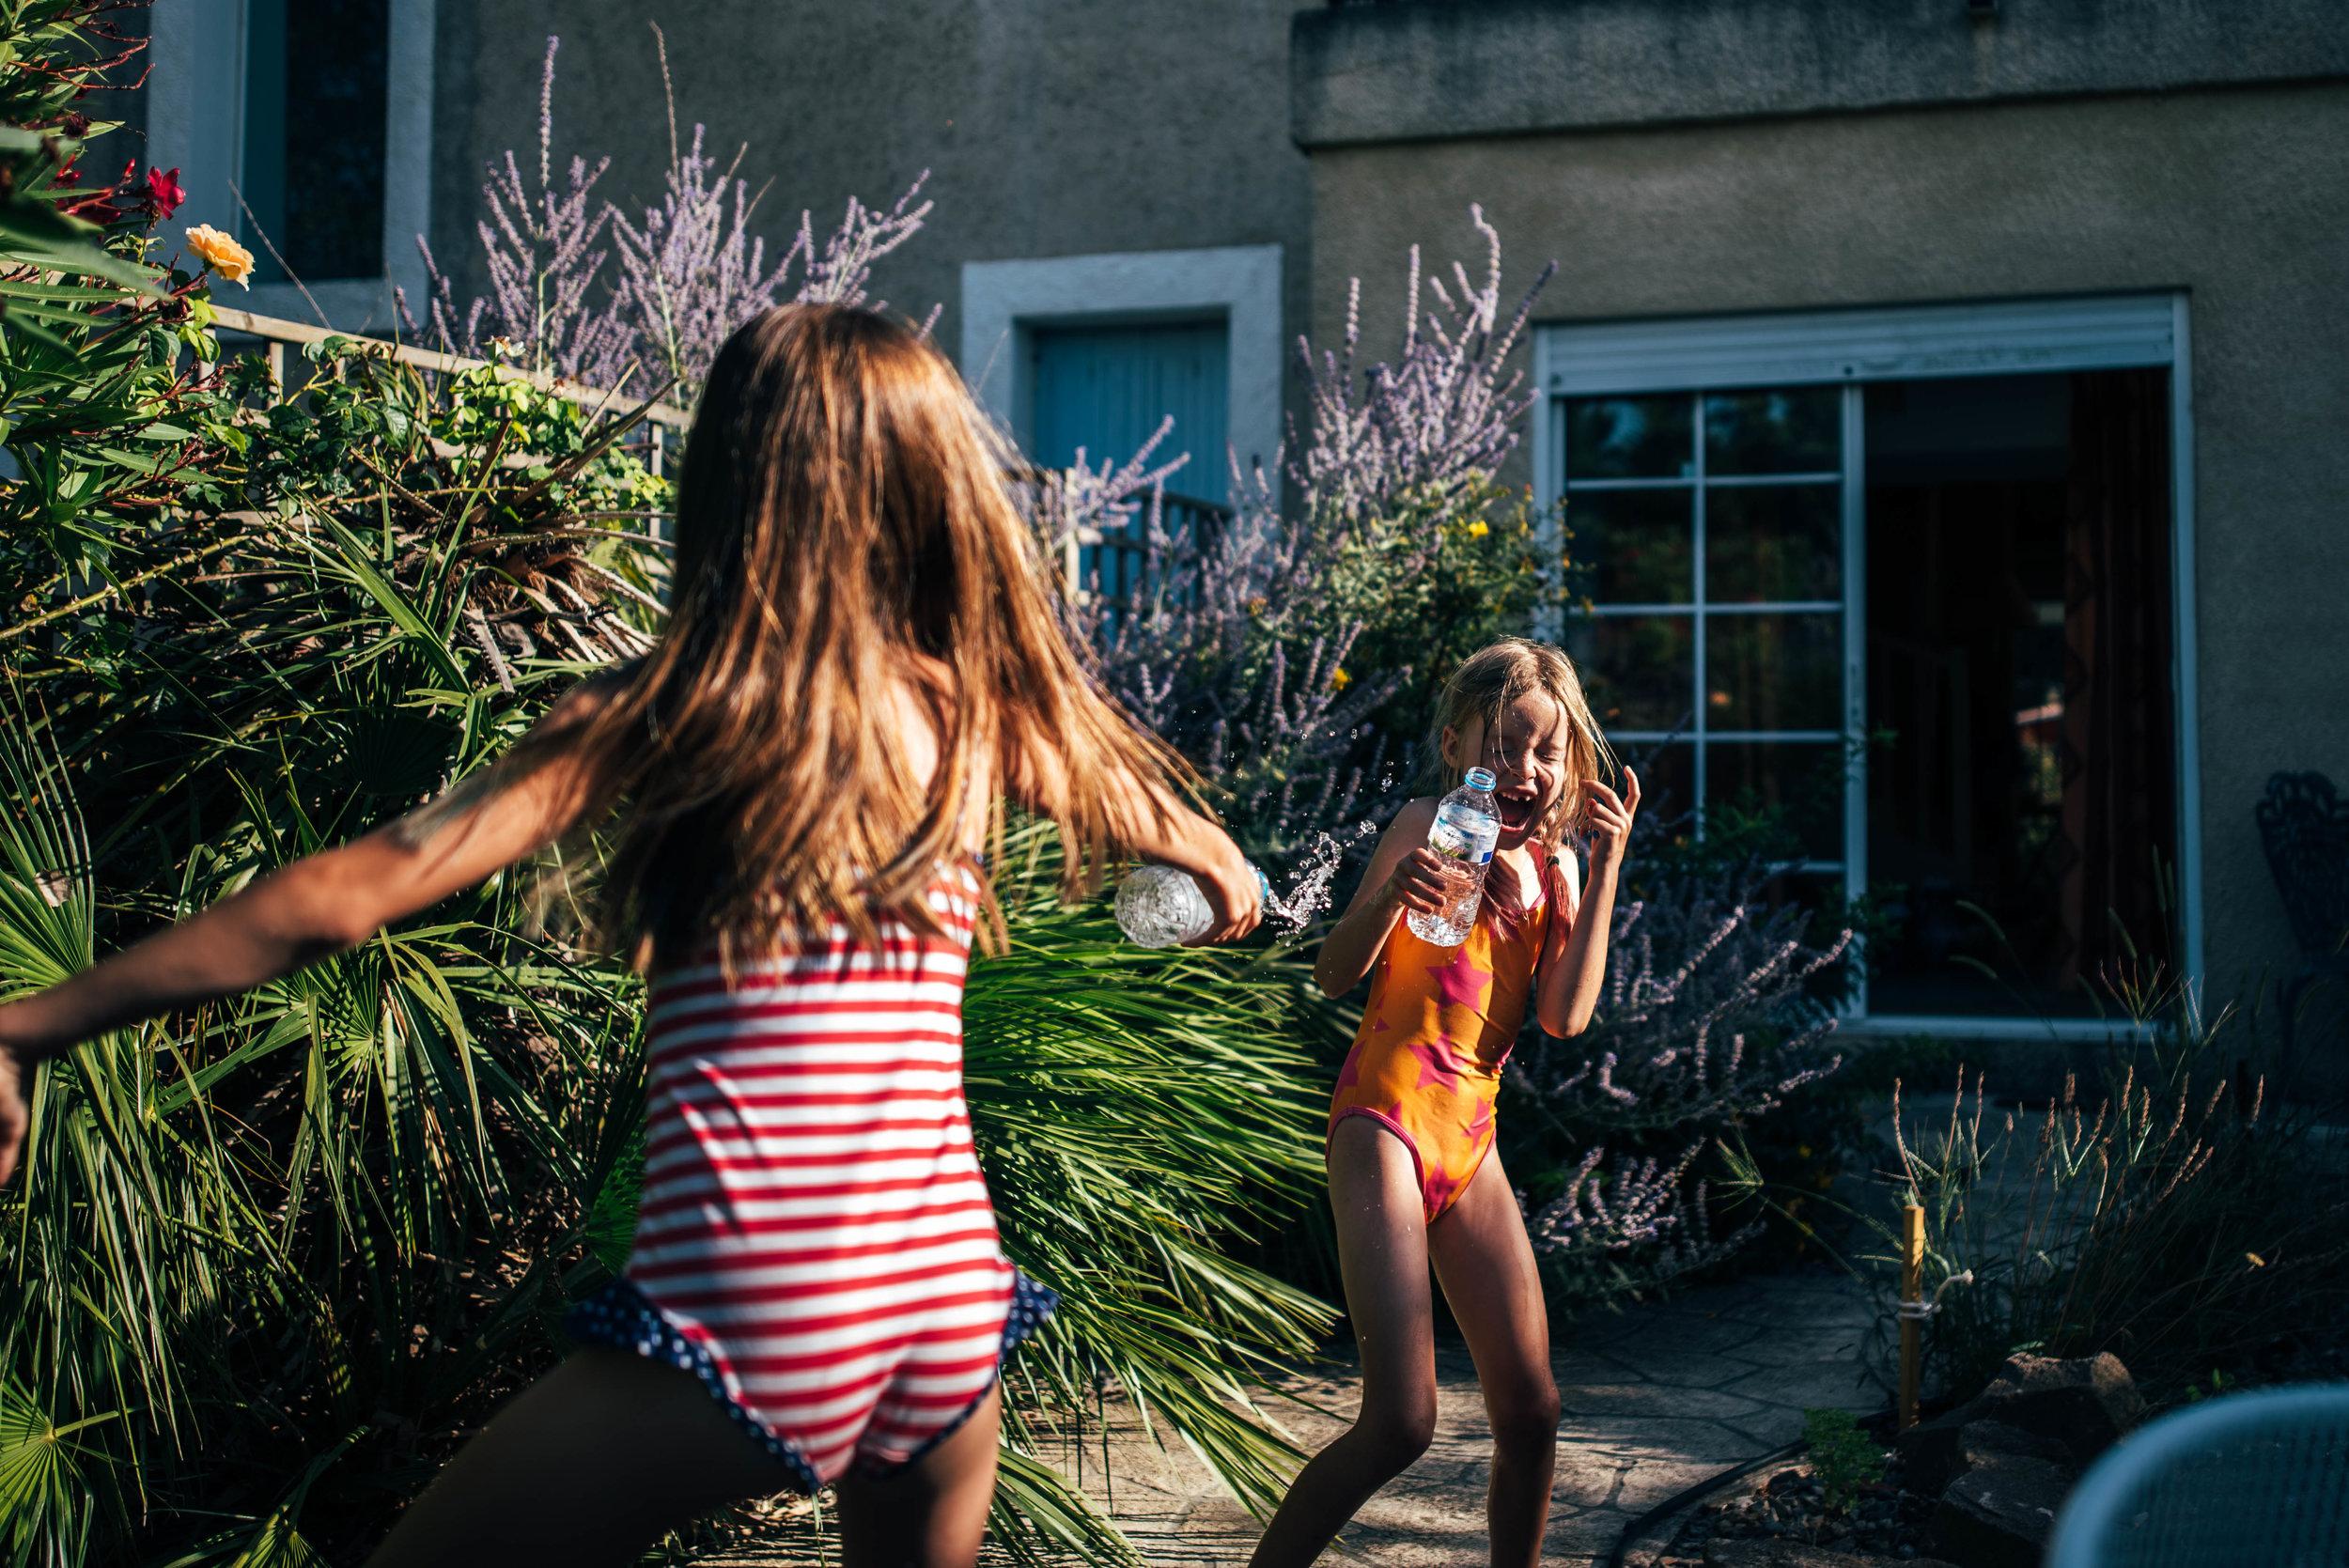 Girls have water fight in garden Essex UK Documentary Photographer